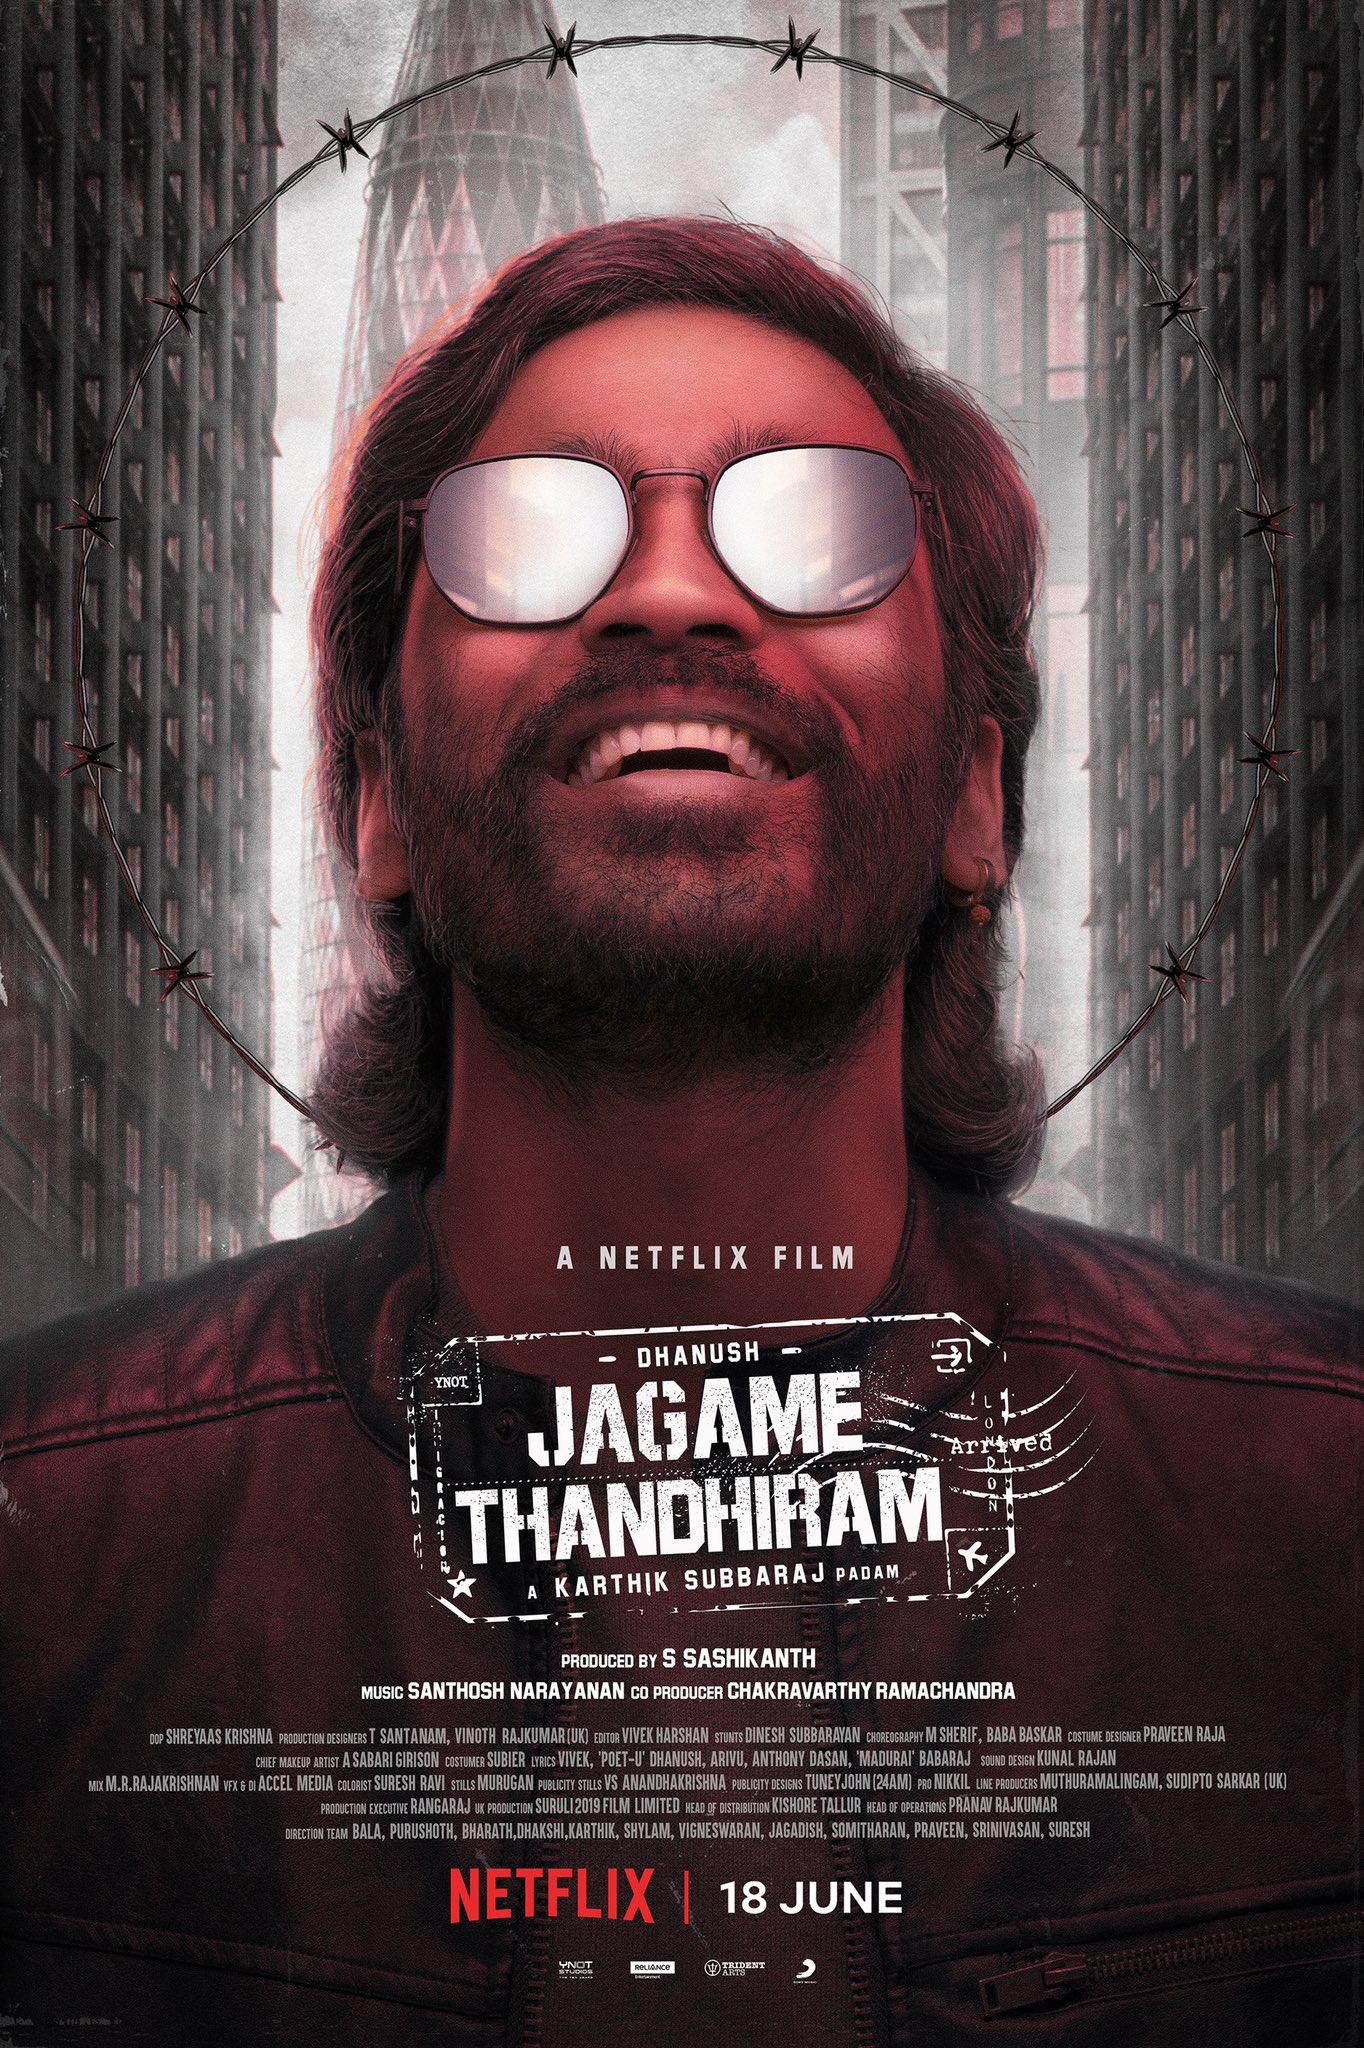 Free Download Jagame Thandhiram Full Movie